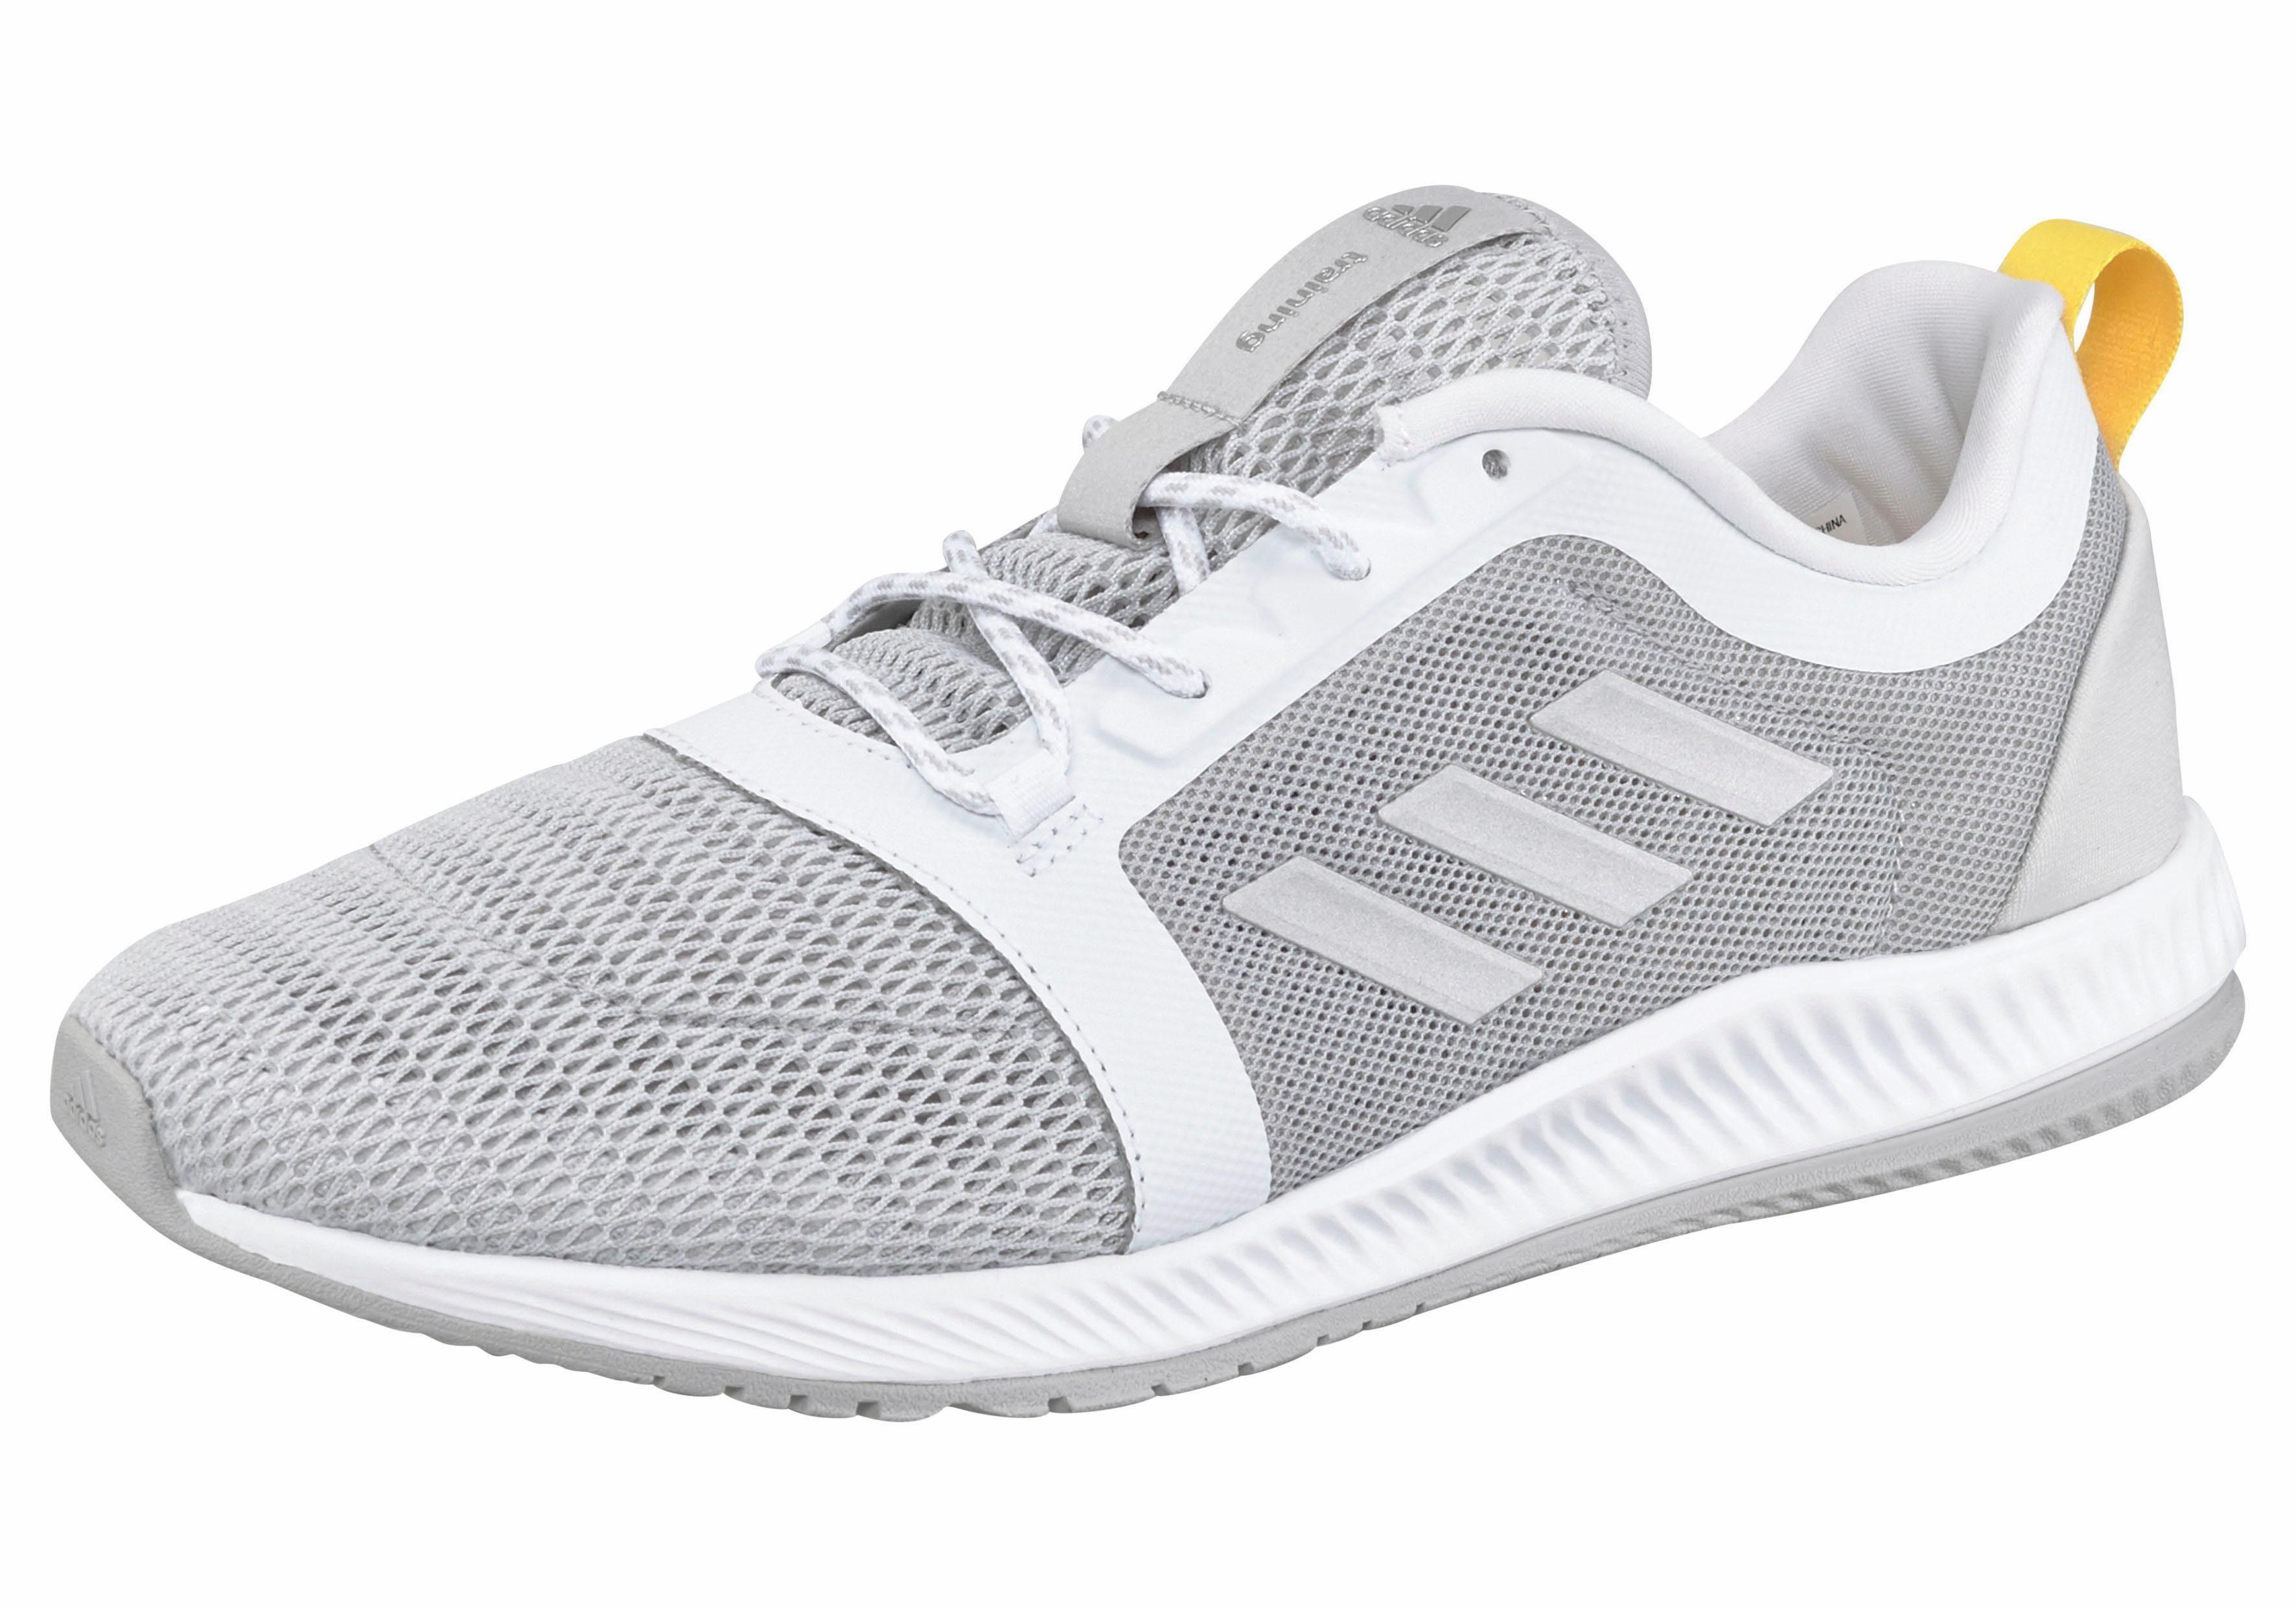 adidas Performance Cool TR Fitnessschuh kaufen  silberfarben